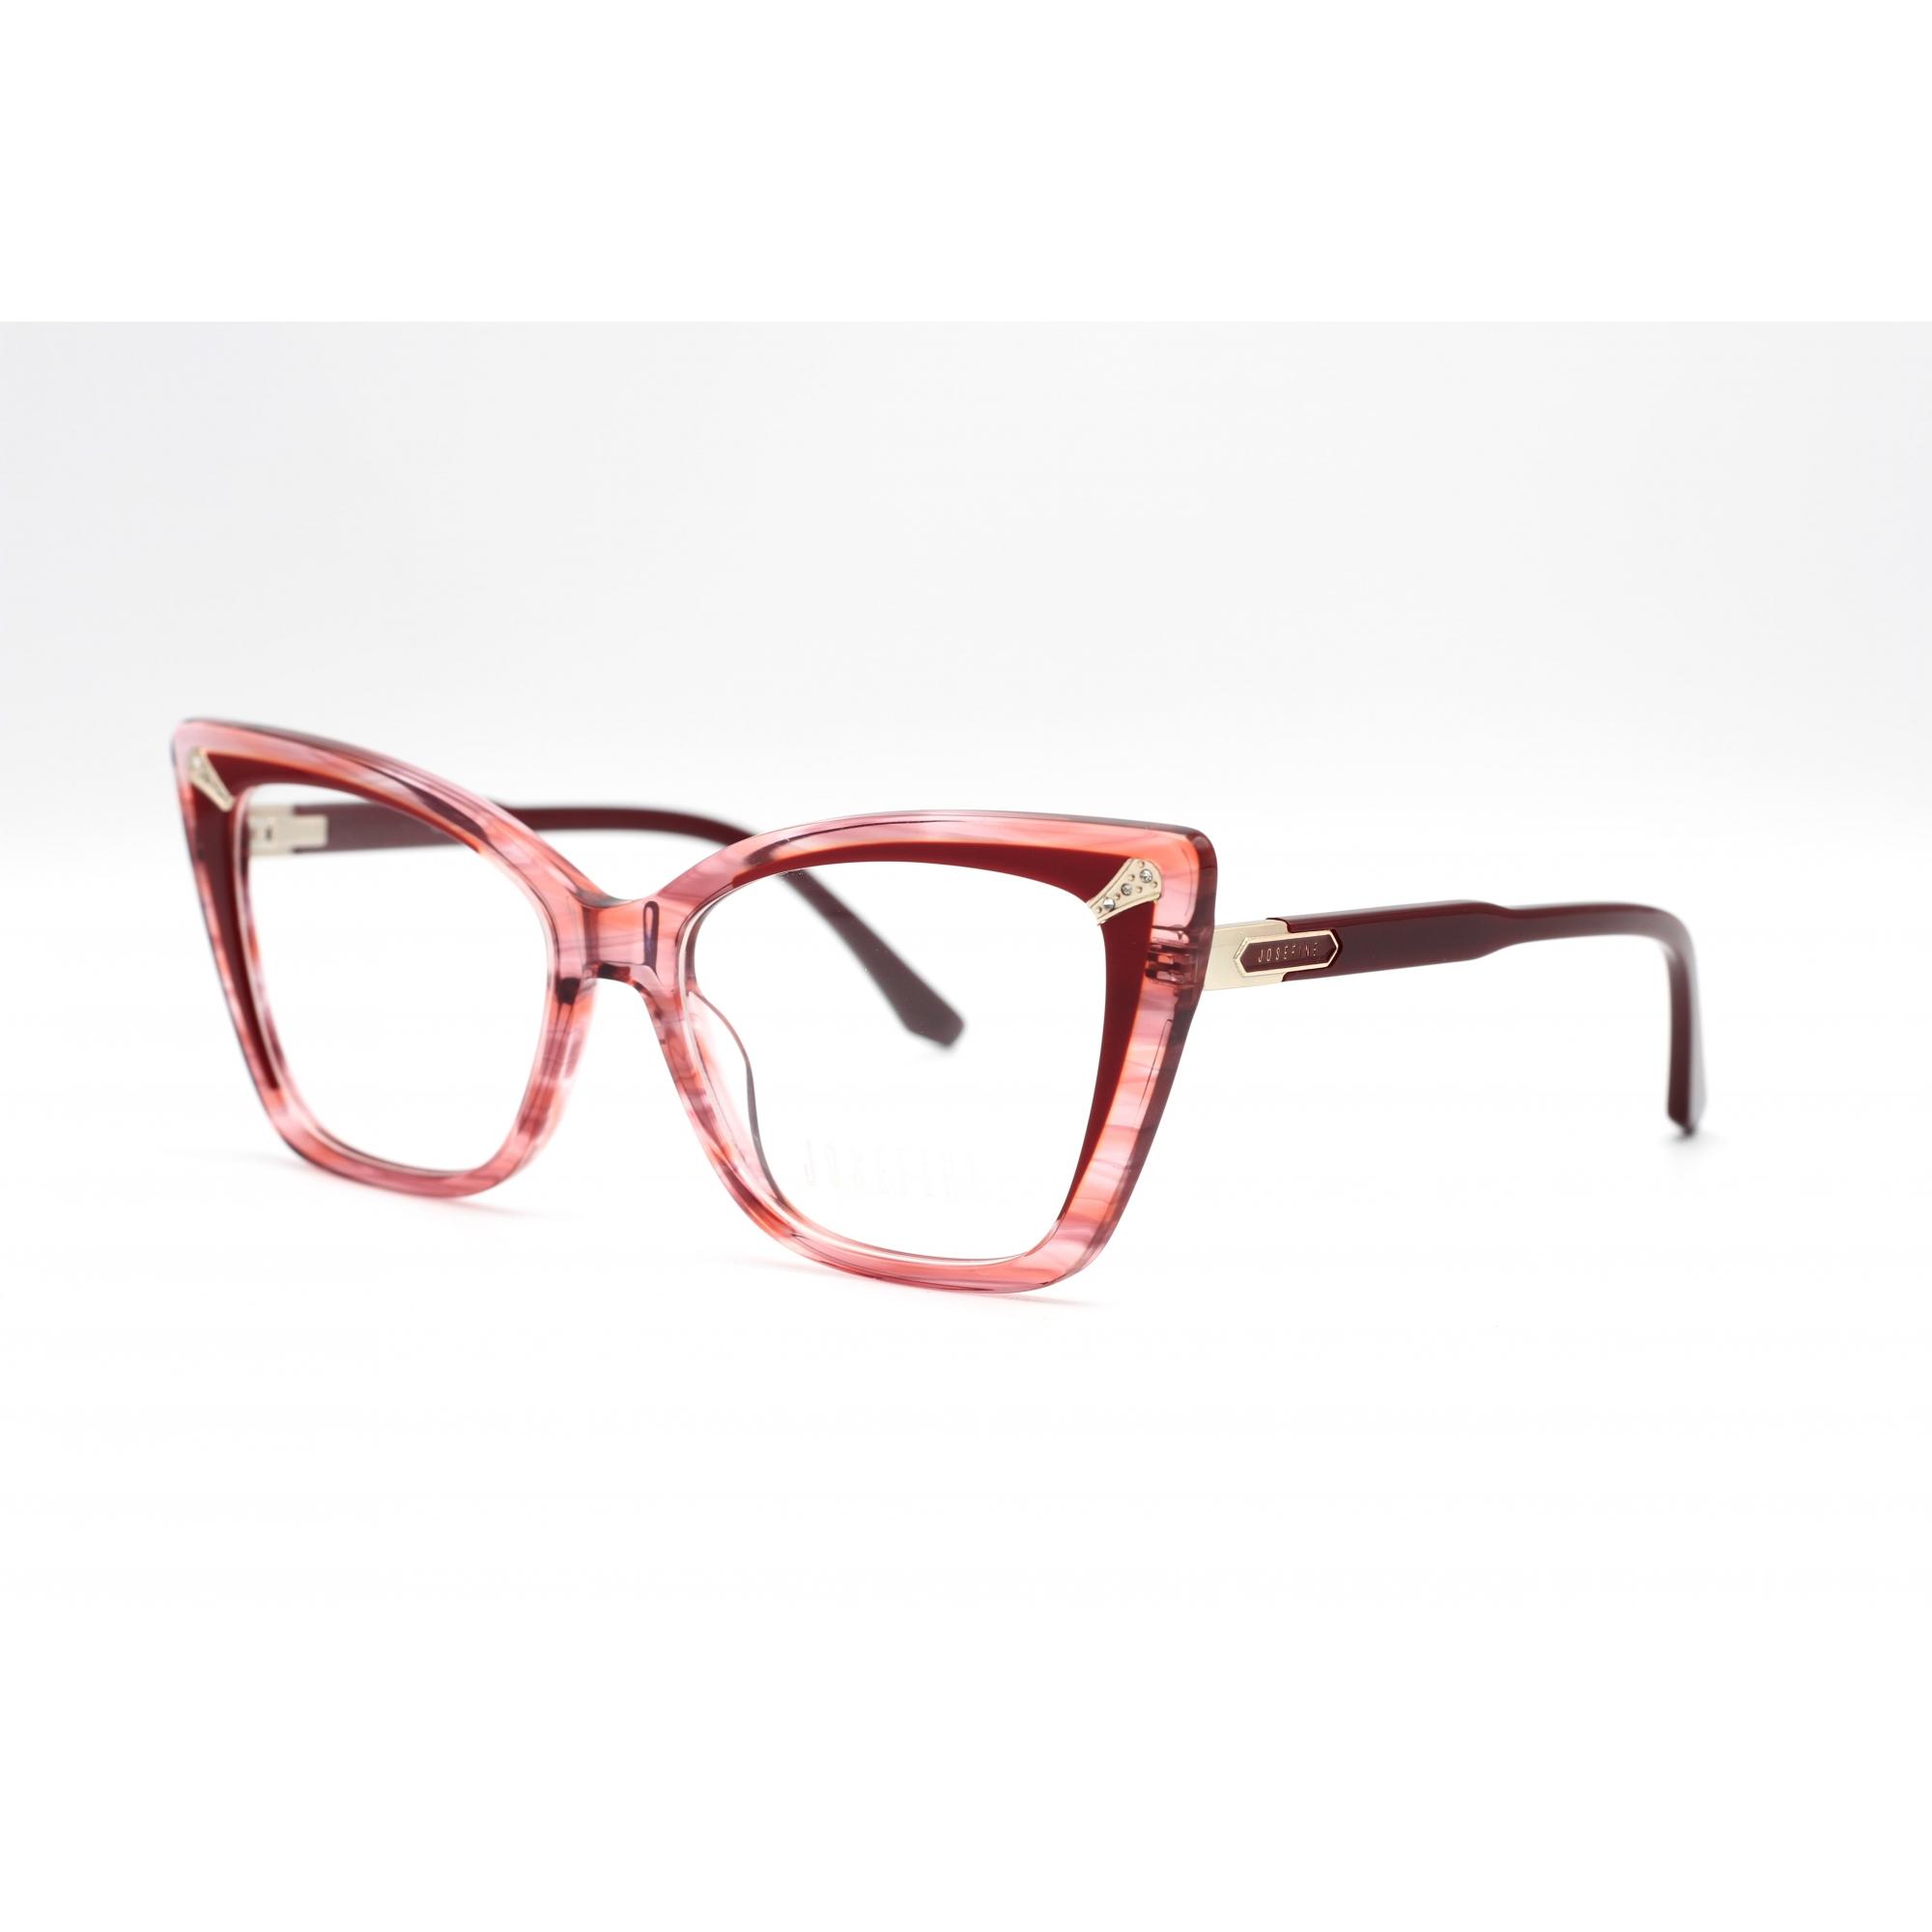 Armação para Óculos marca Josefine ref MB4628 C2 54